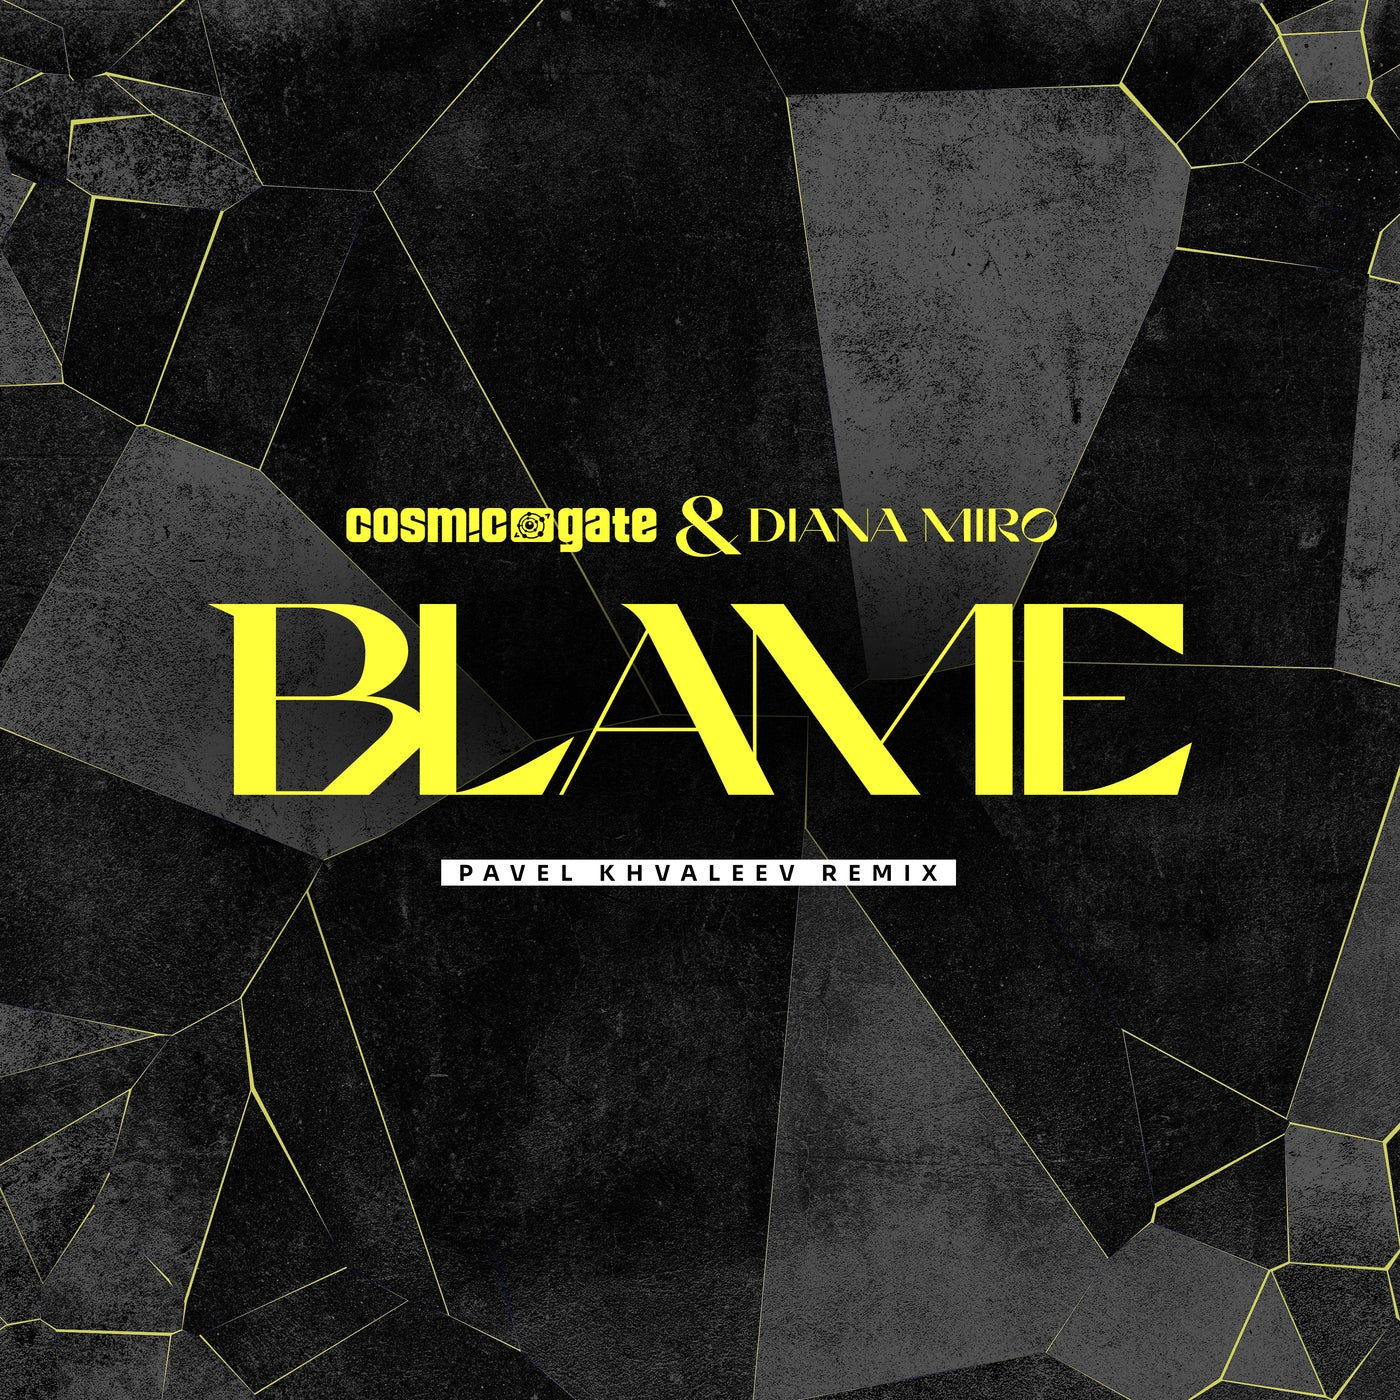 Blame (Pavel Khvaleev Extended Remix)